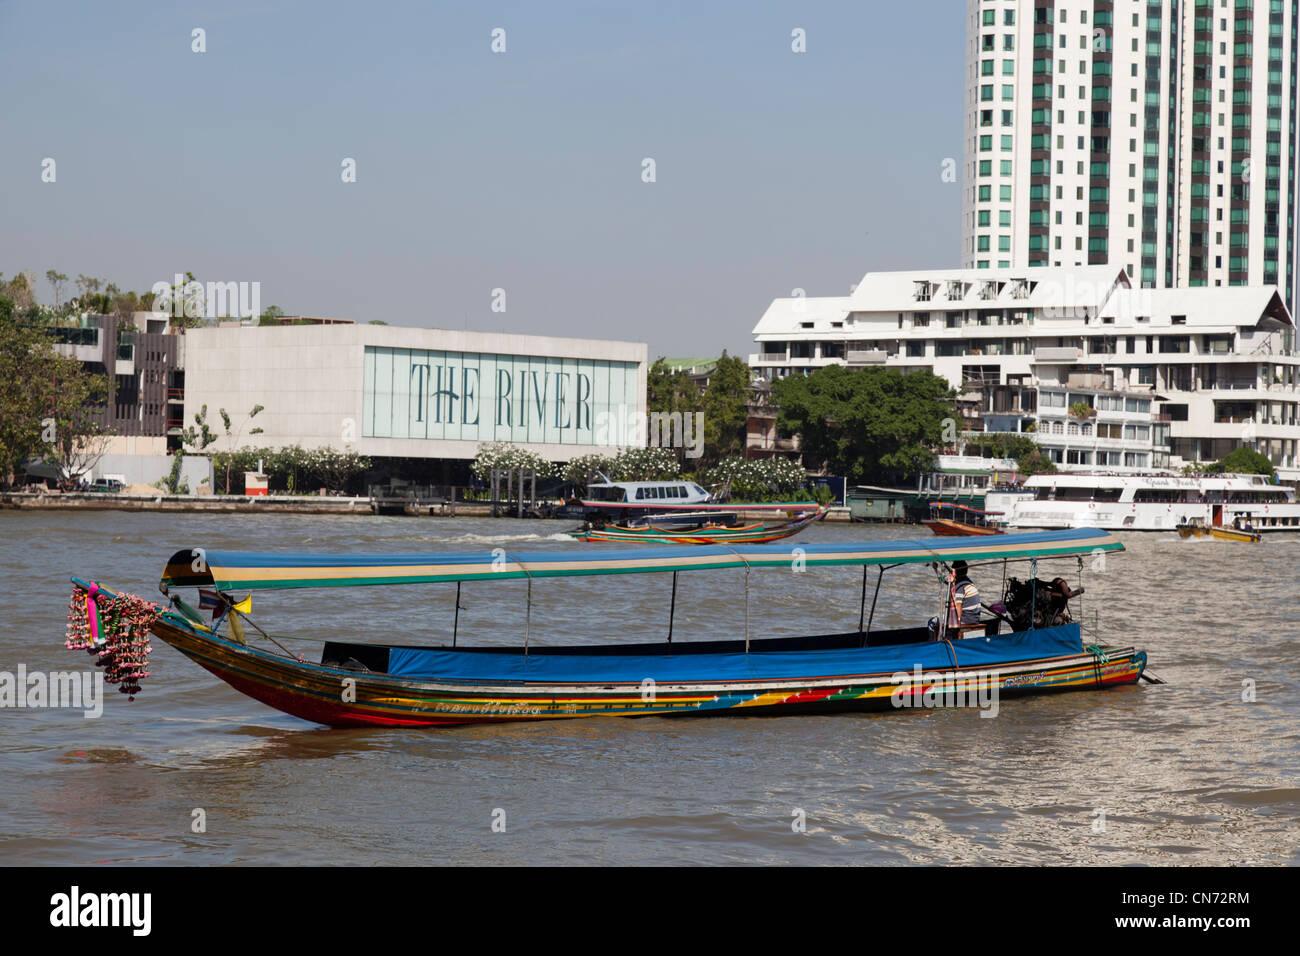 "A long-tail boat in search of tourists on the Chao Phraya river (Bangkok). Bateau dit ""à longue queue"" sur le fleuve Stock Photo"